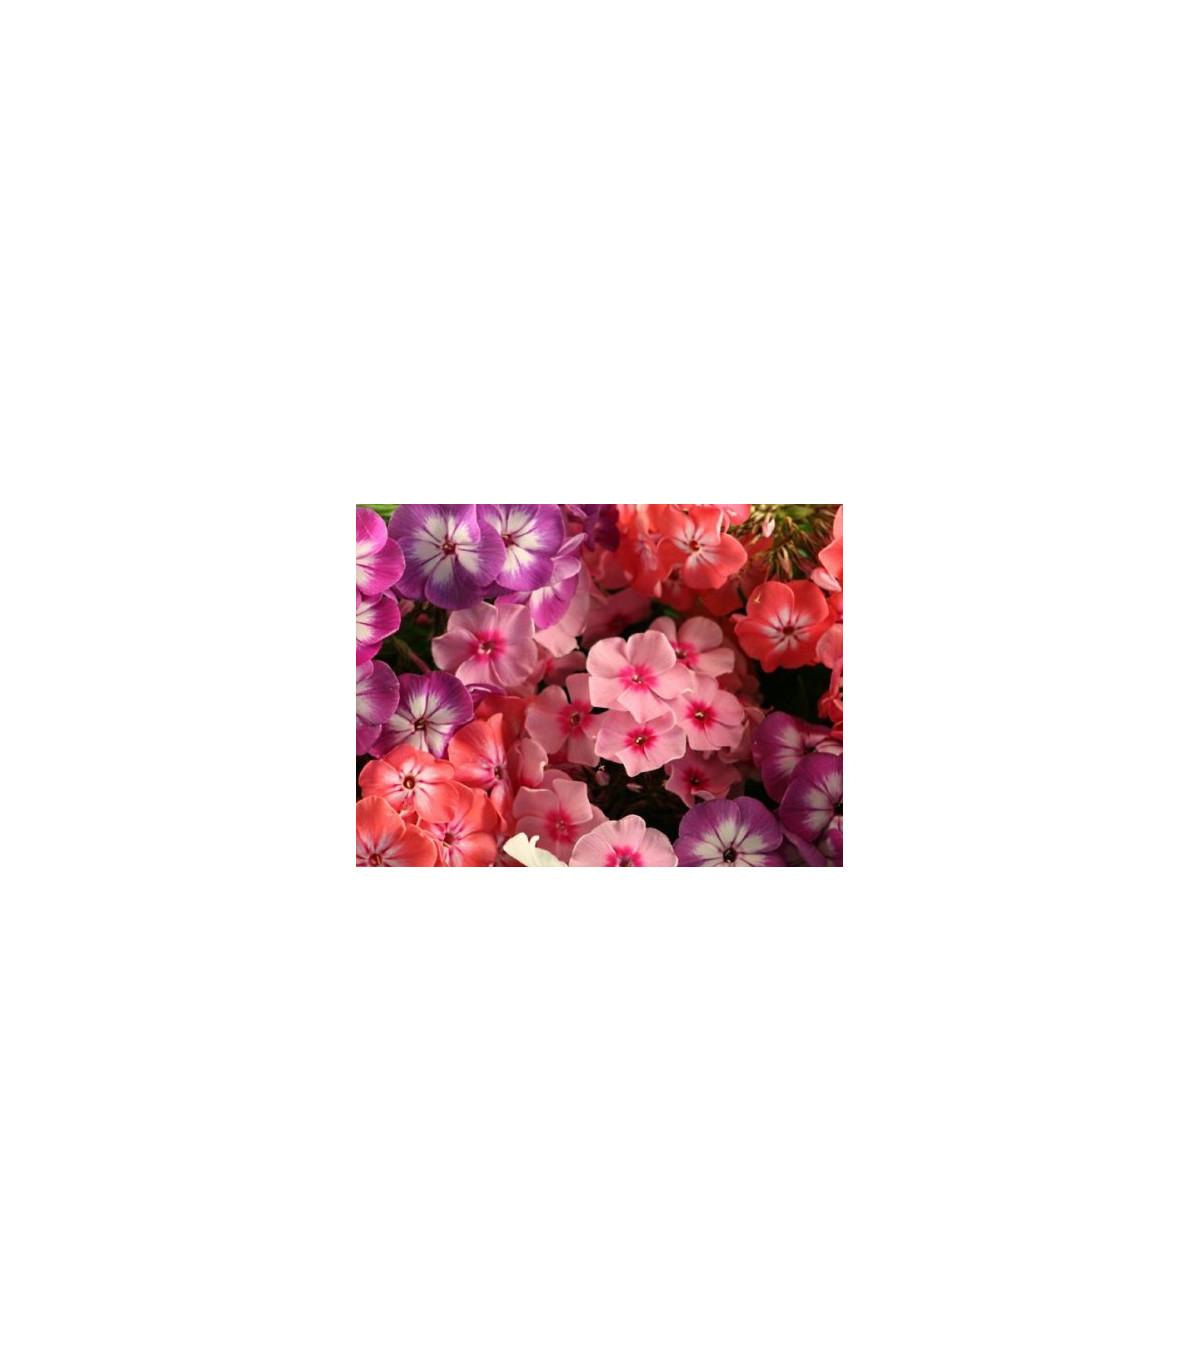 Plaménka Drummondova vysoká - směs barev  - Phlox drum.  - semena Plaménky - 0,2 gr